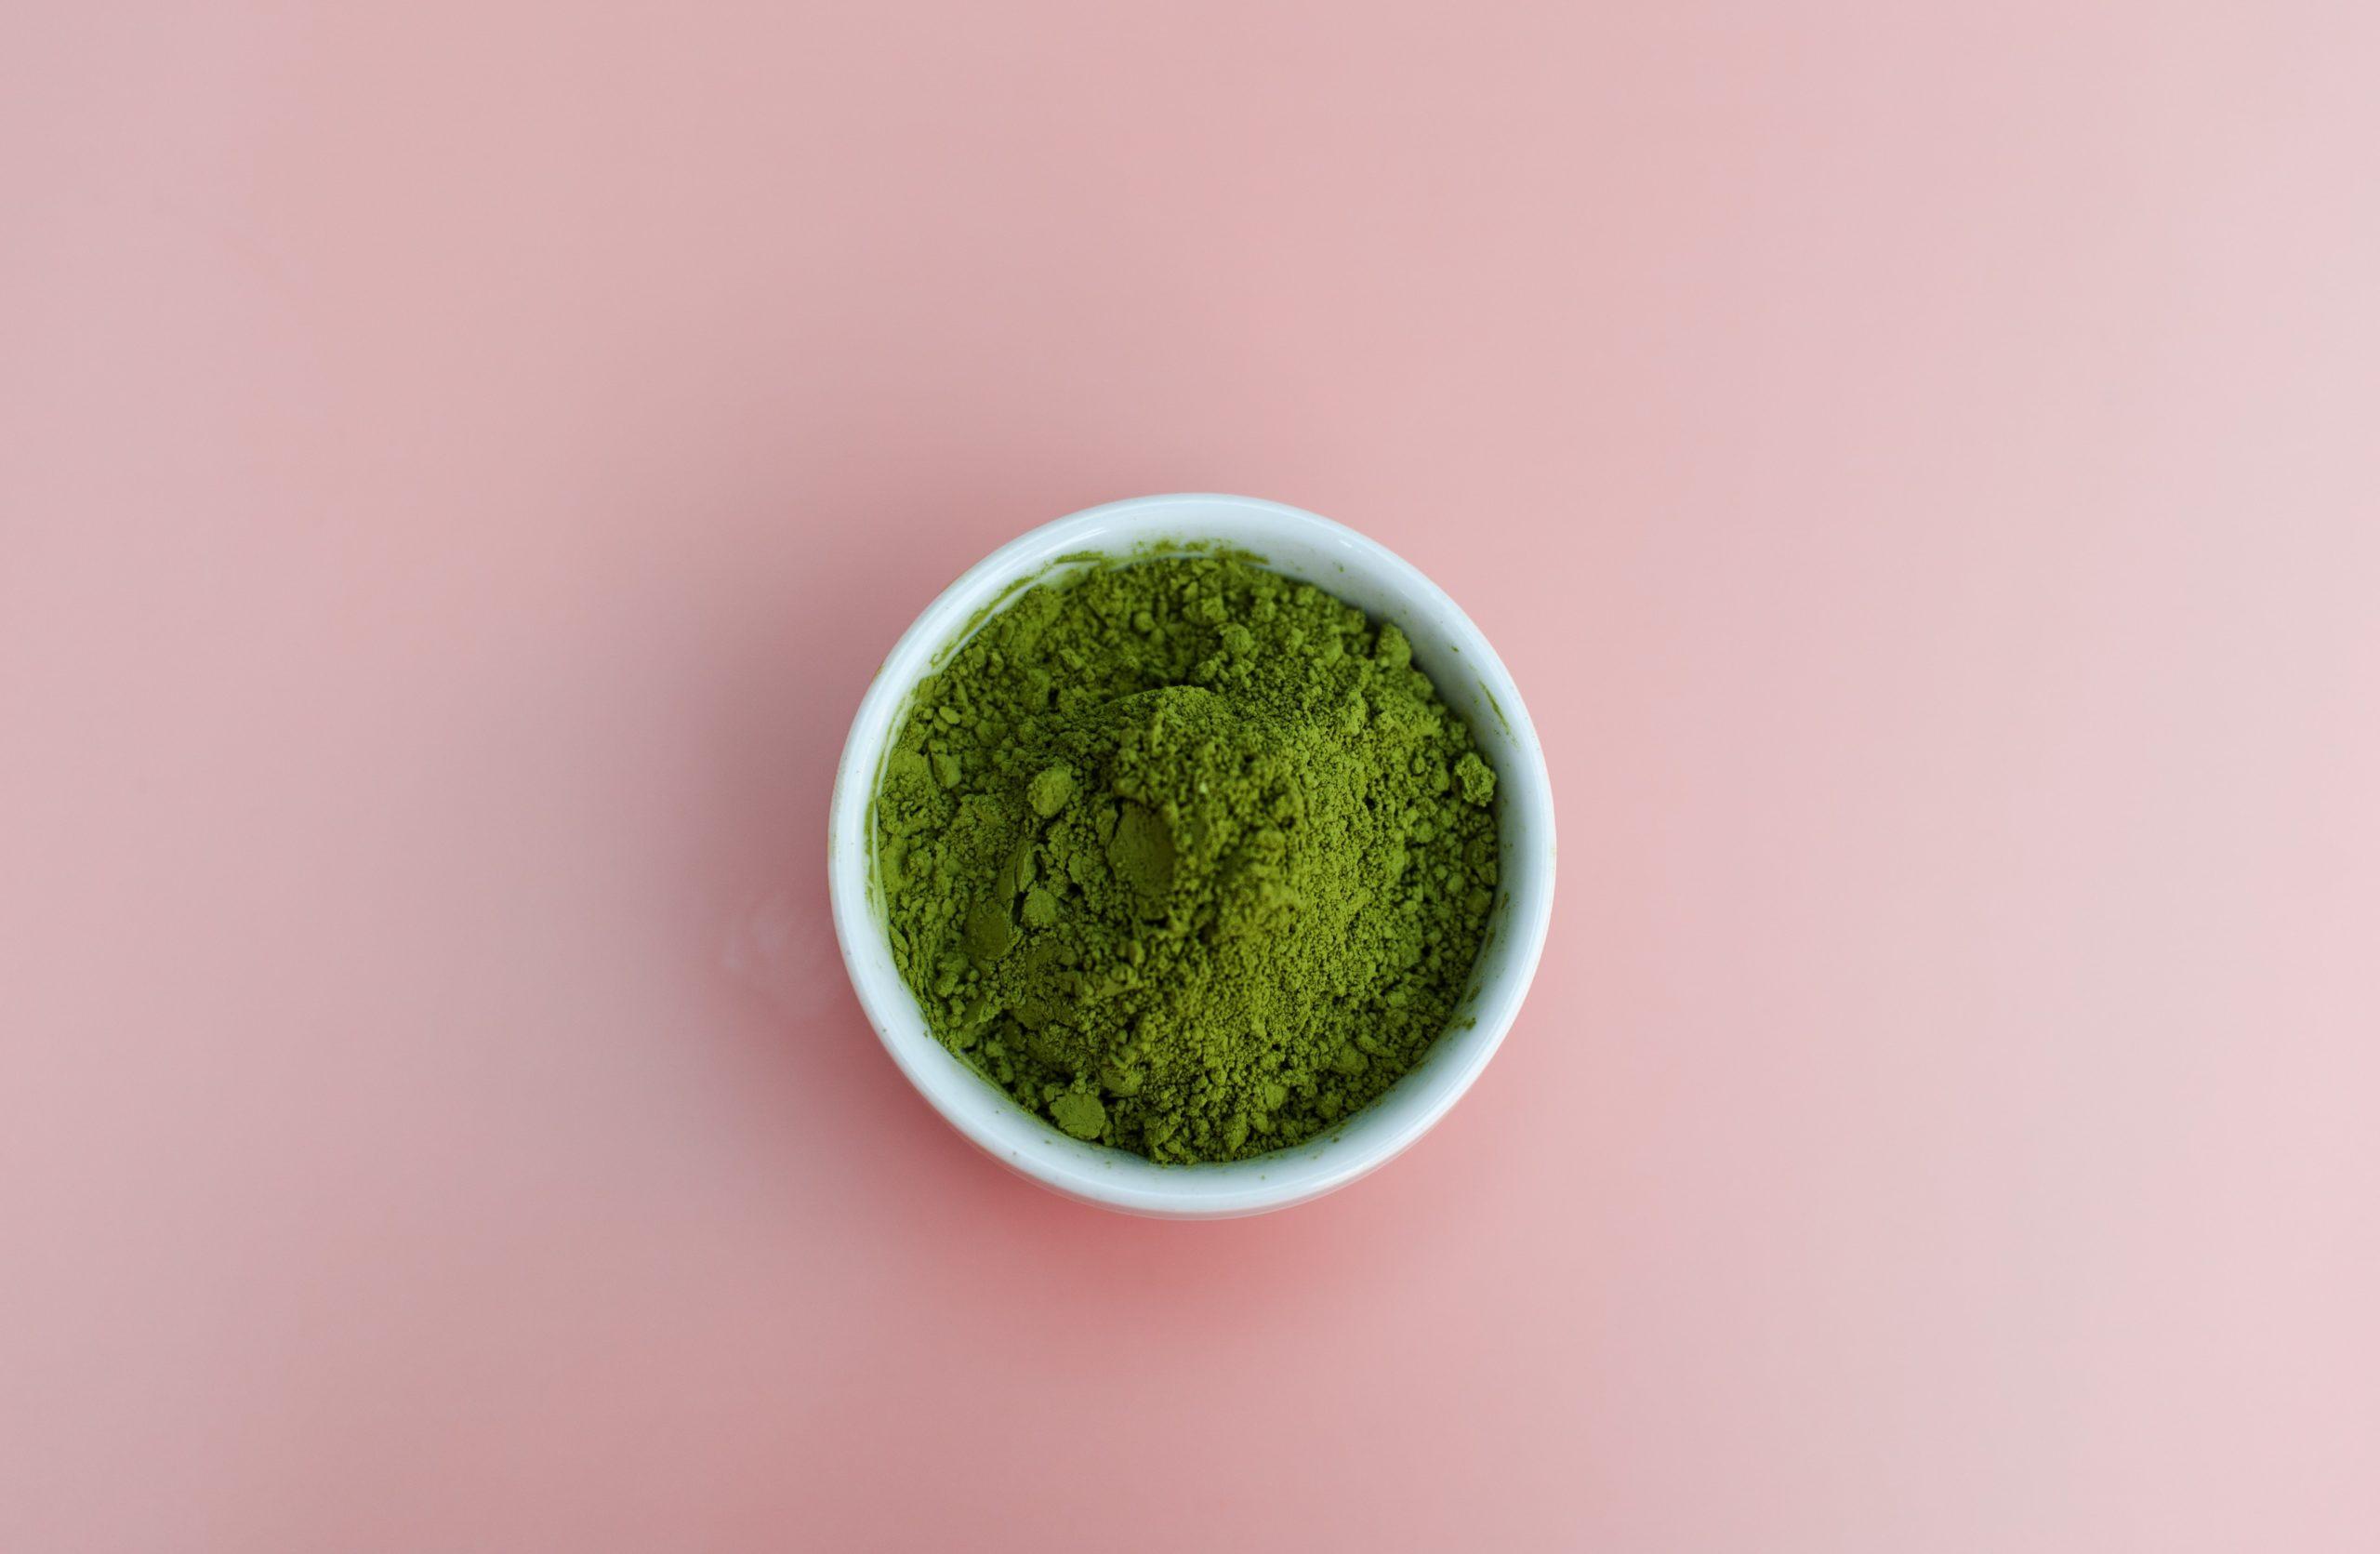 matcha-green-tea-powder-lattes